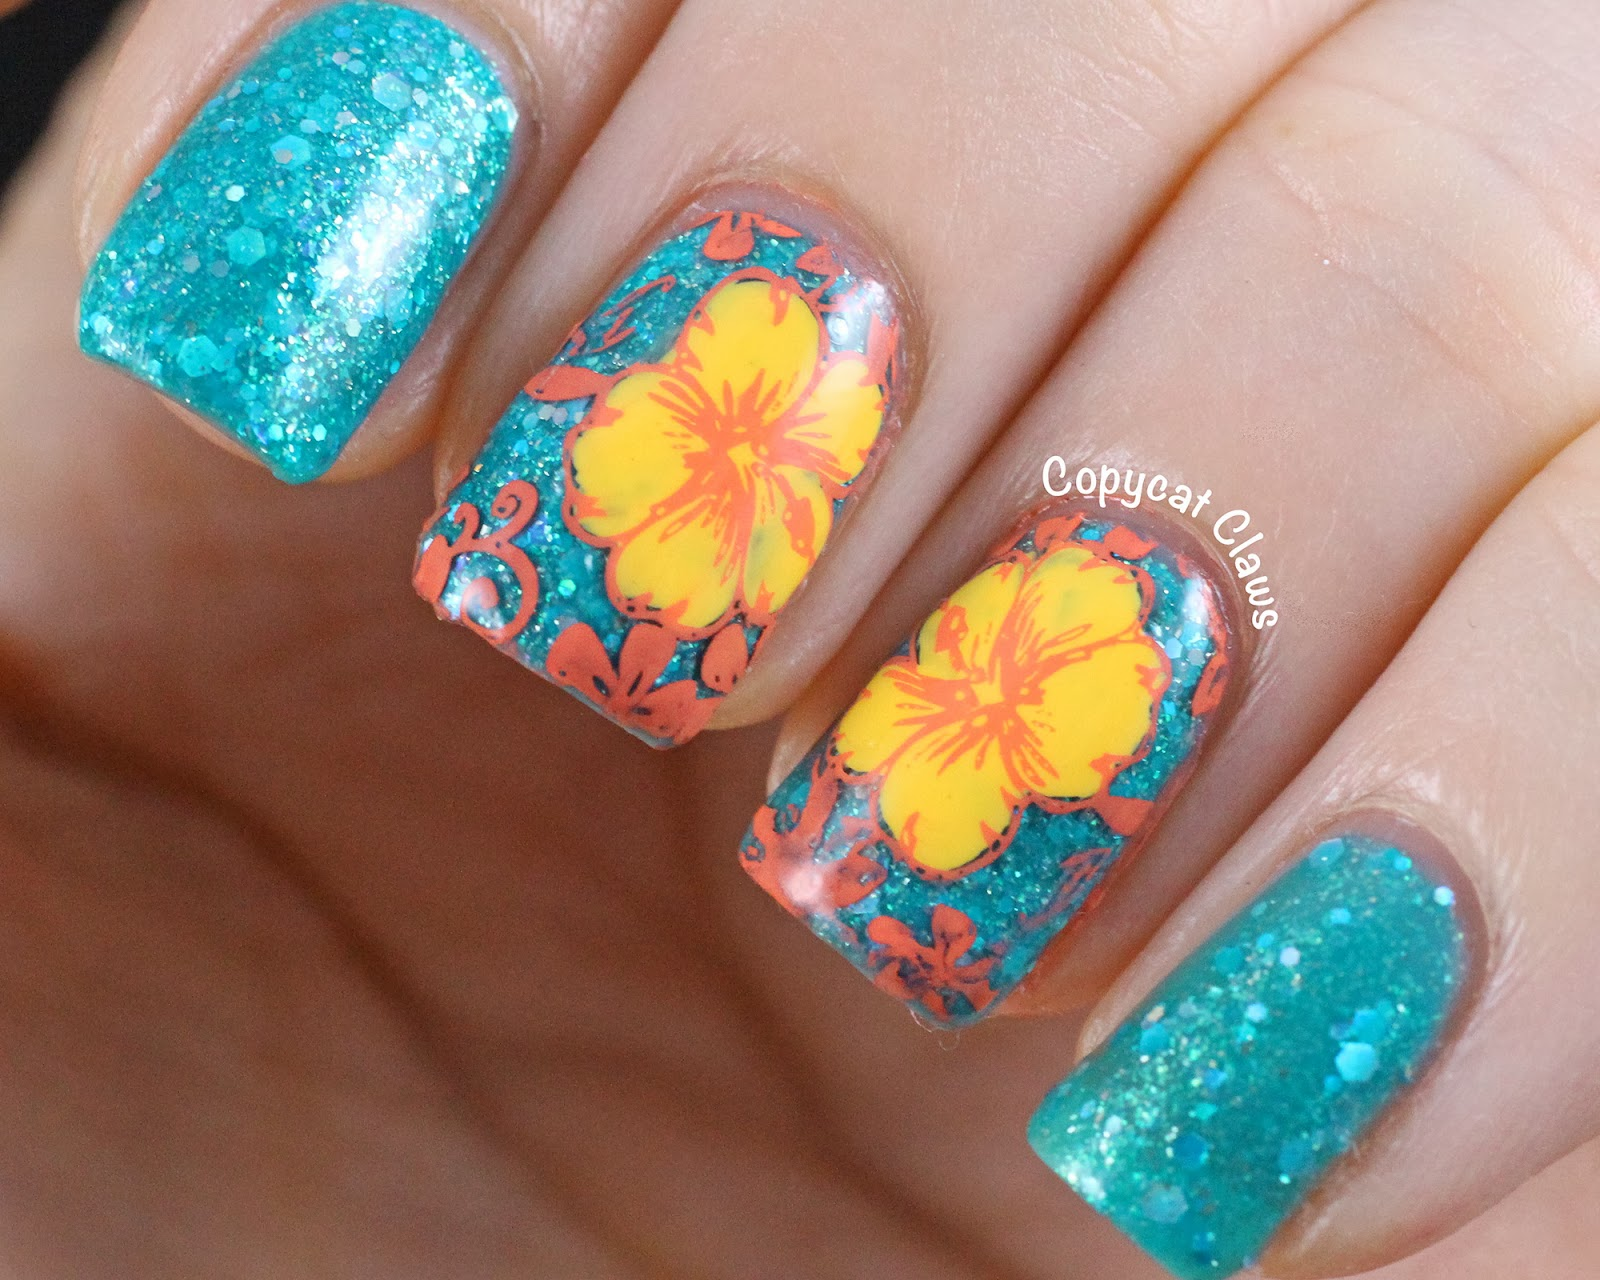 Copycat claws sunday stamping favorite flower izmirmasajfo